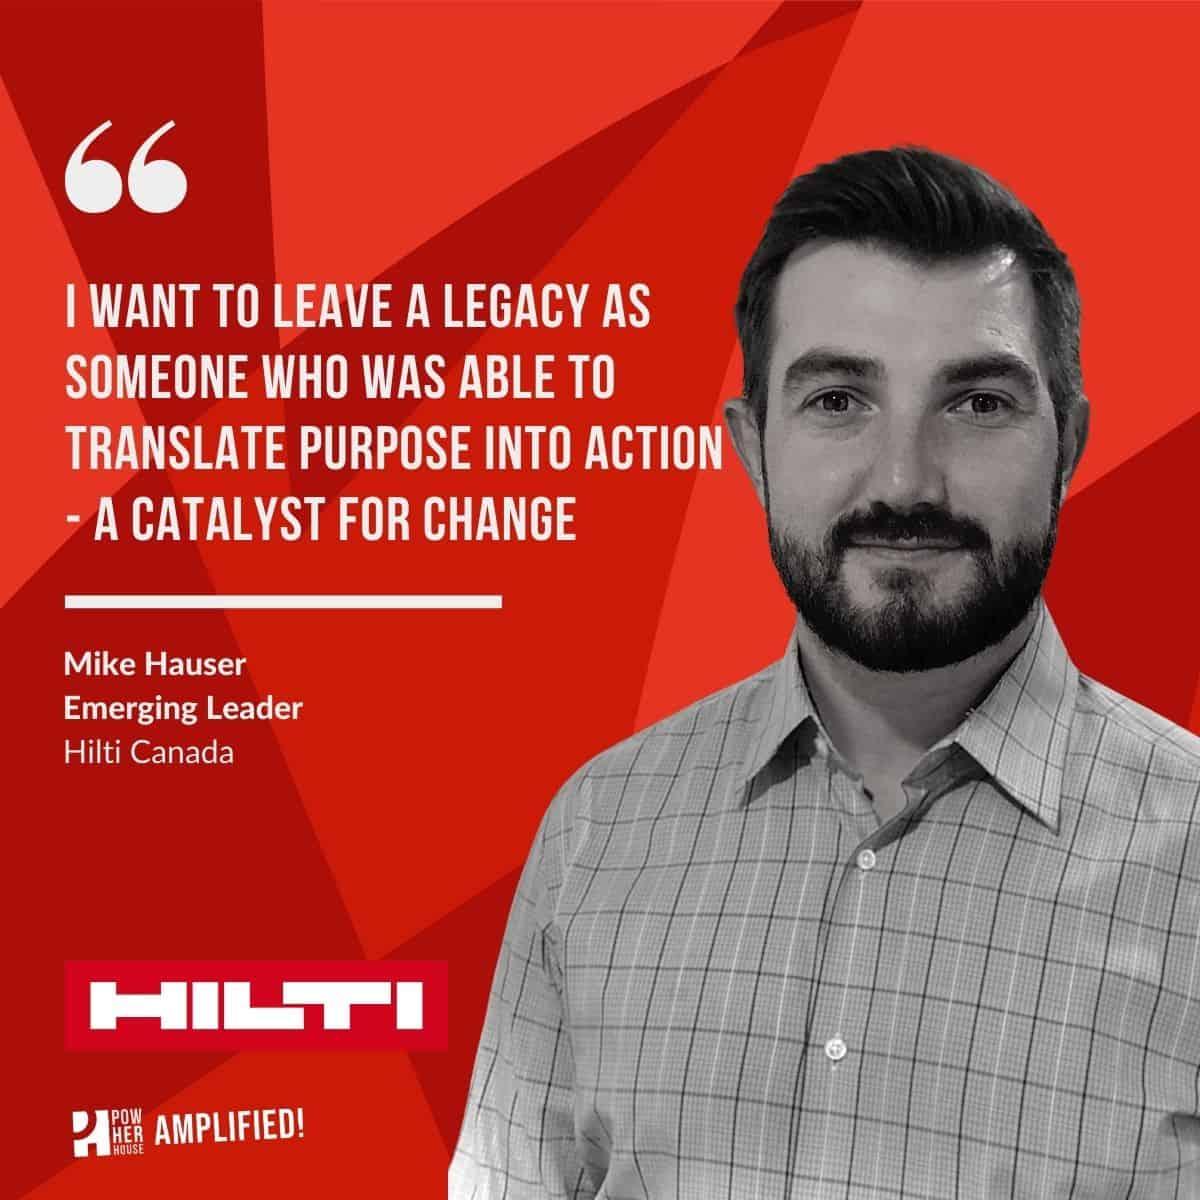 Hilti profile - Mike